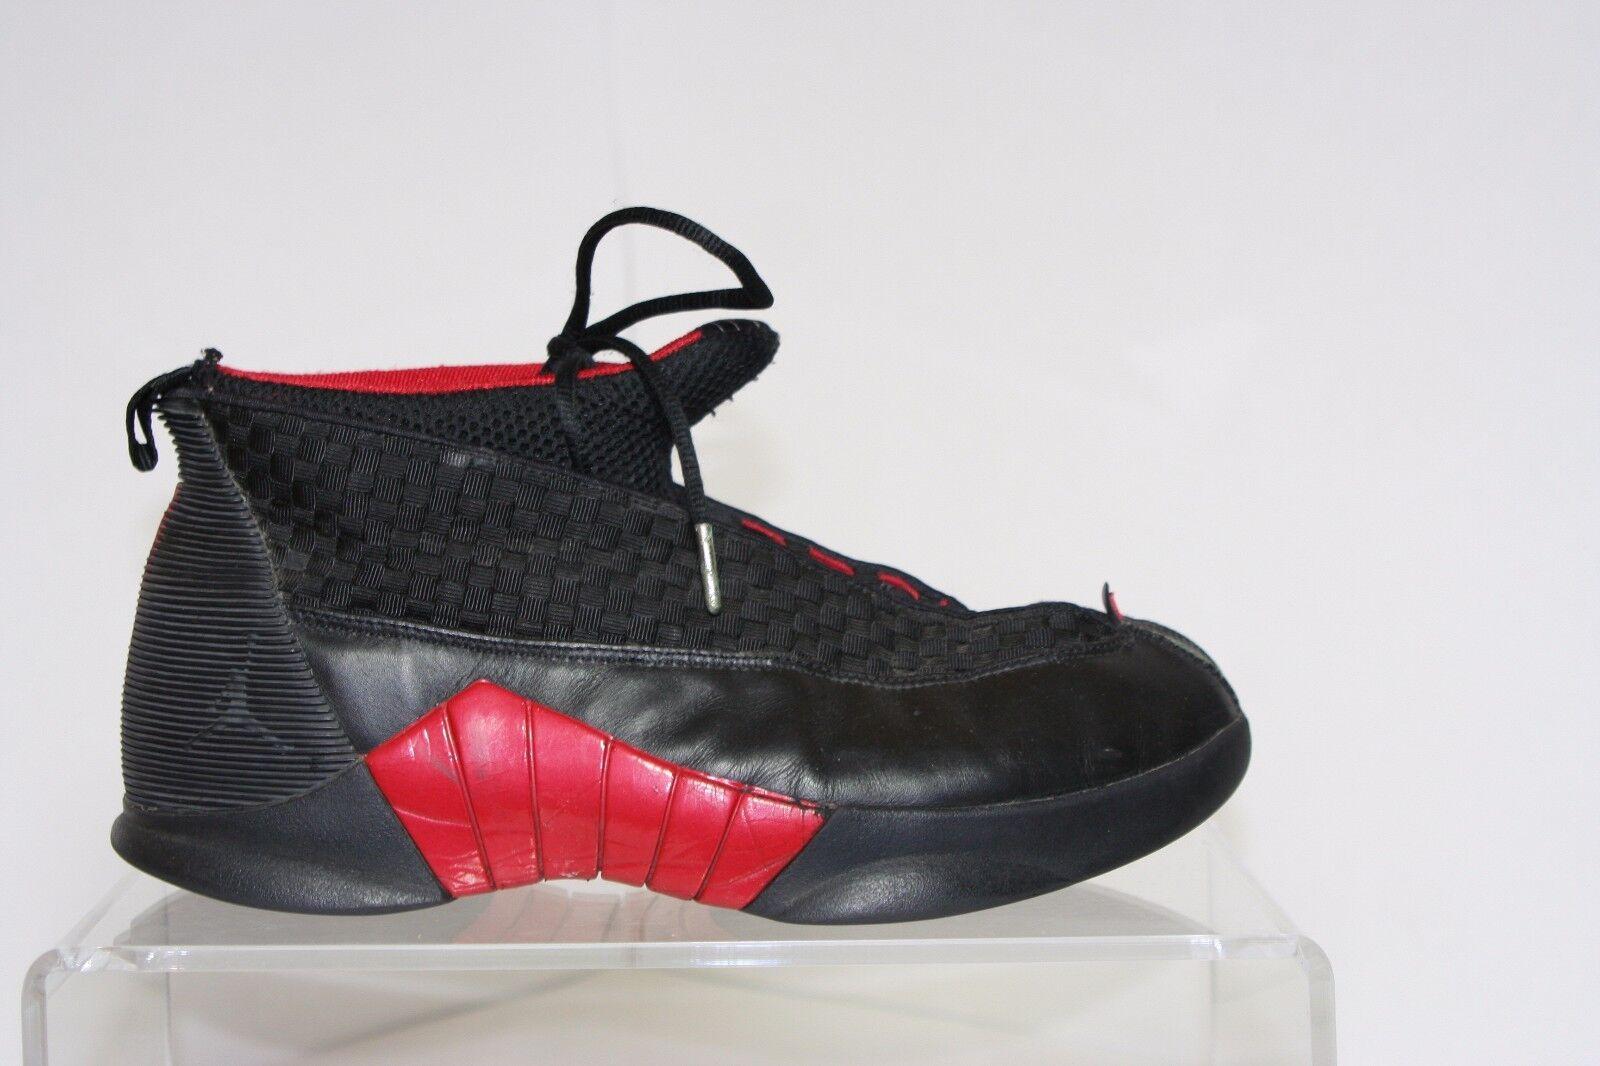 Nike Tenis Jordan 15 Retro bred Tenis Nike Air Athletic Multi de cuero para hombre 8.5 eb1bb9